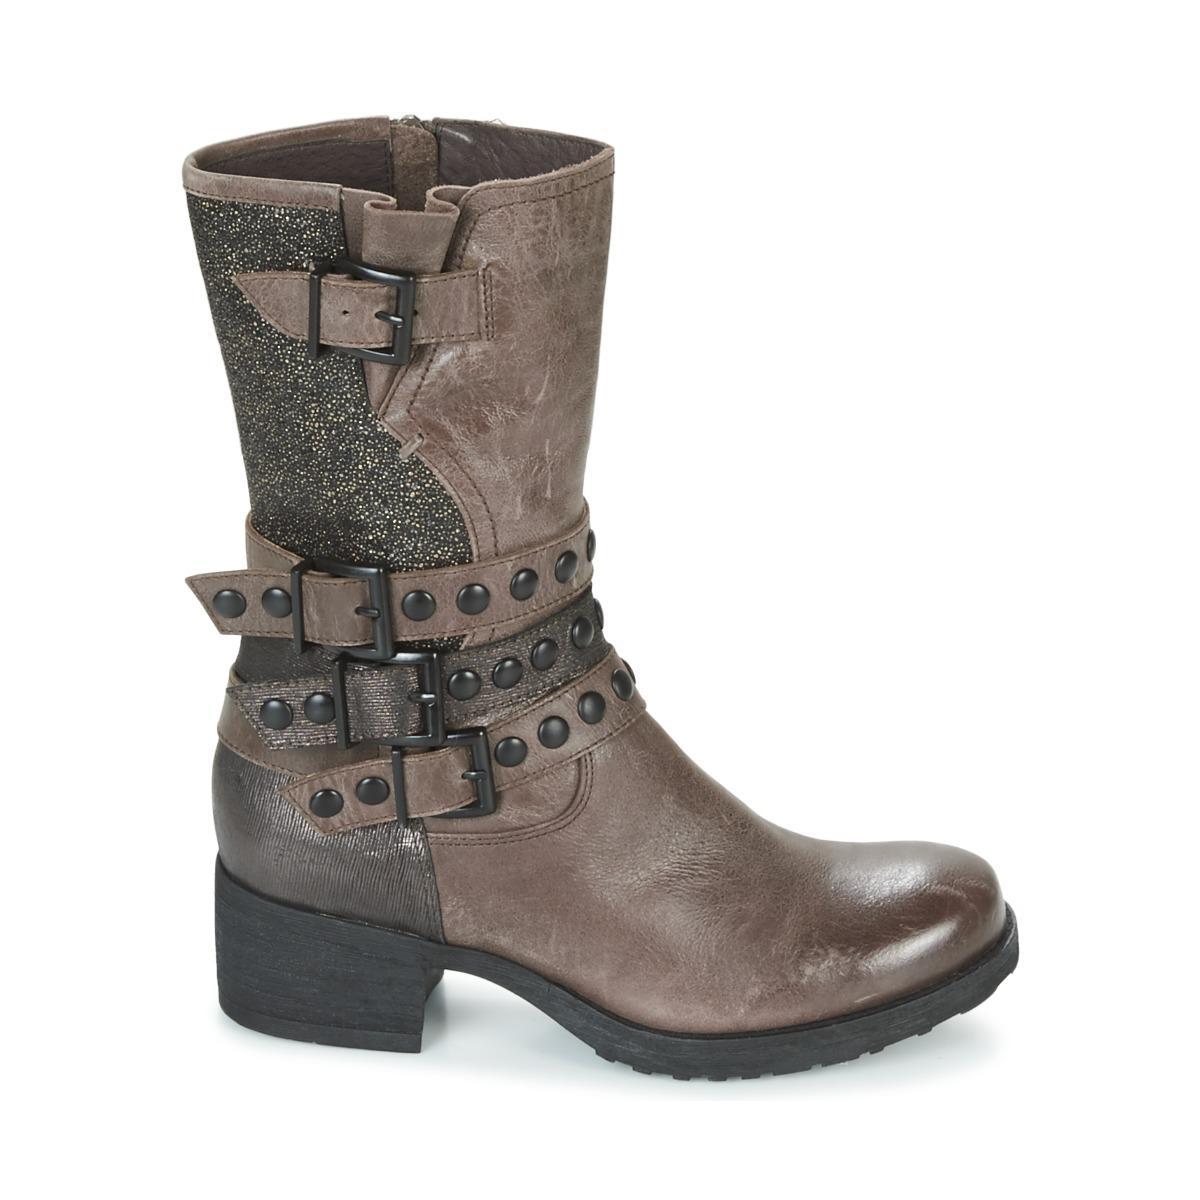 MAM DISCO women's High Boots in Exclusive 5rCOGcF2c